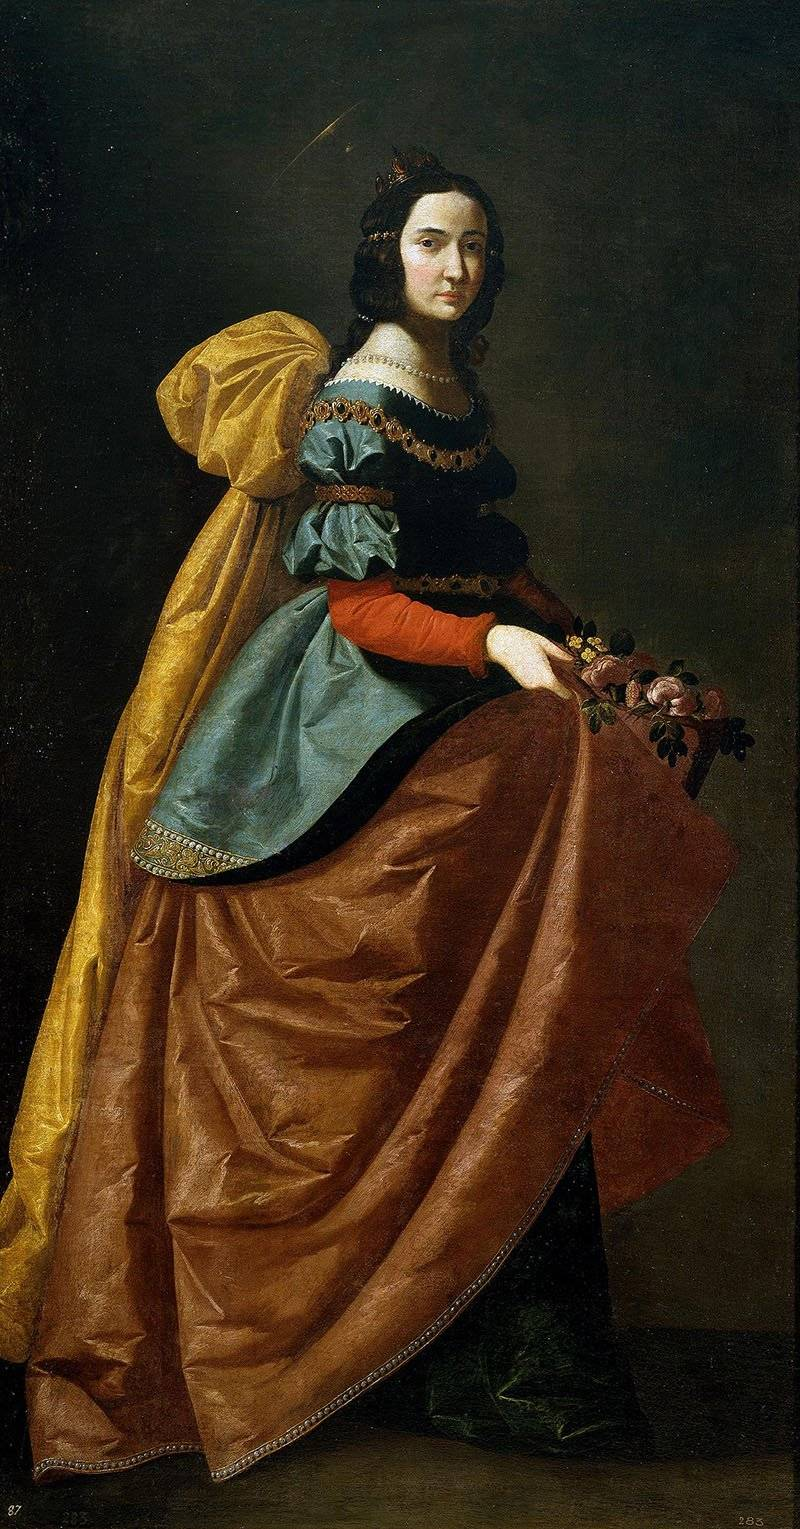 Francisco de Zurbarán Santa Isabel de Portugal. צילום: ויקיפדיה